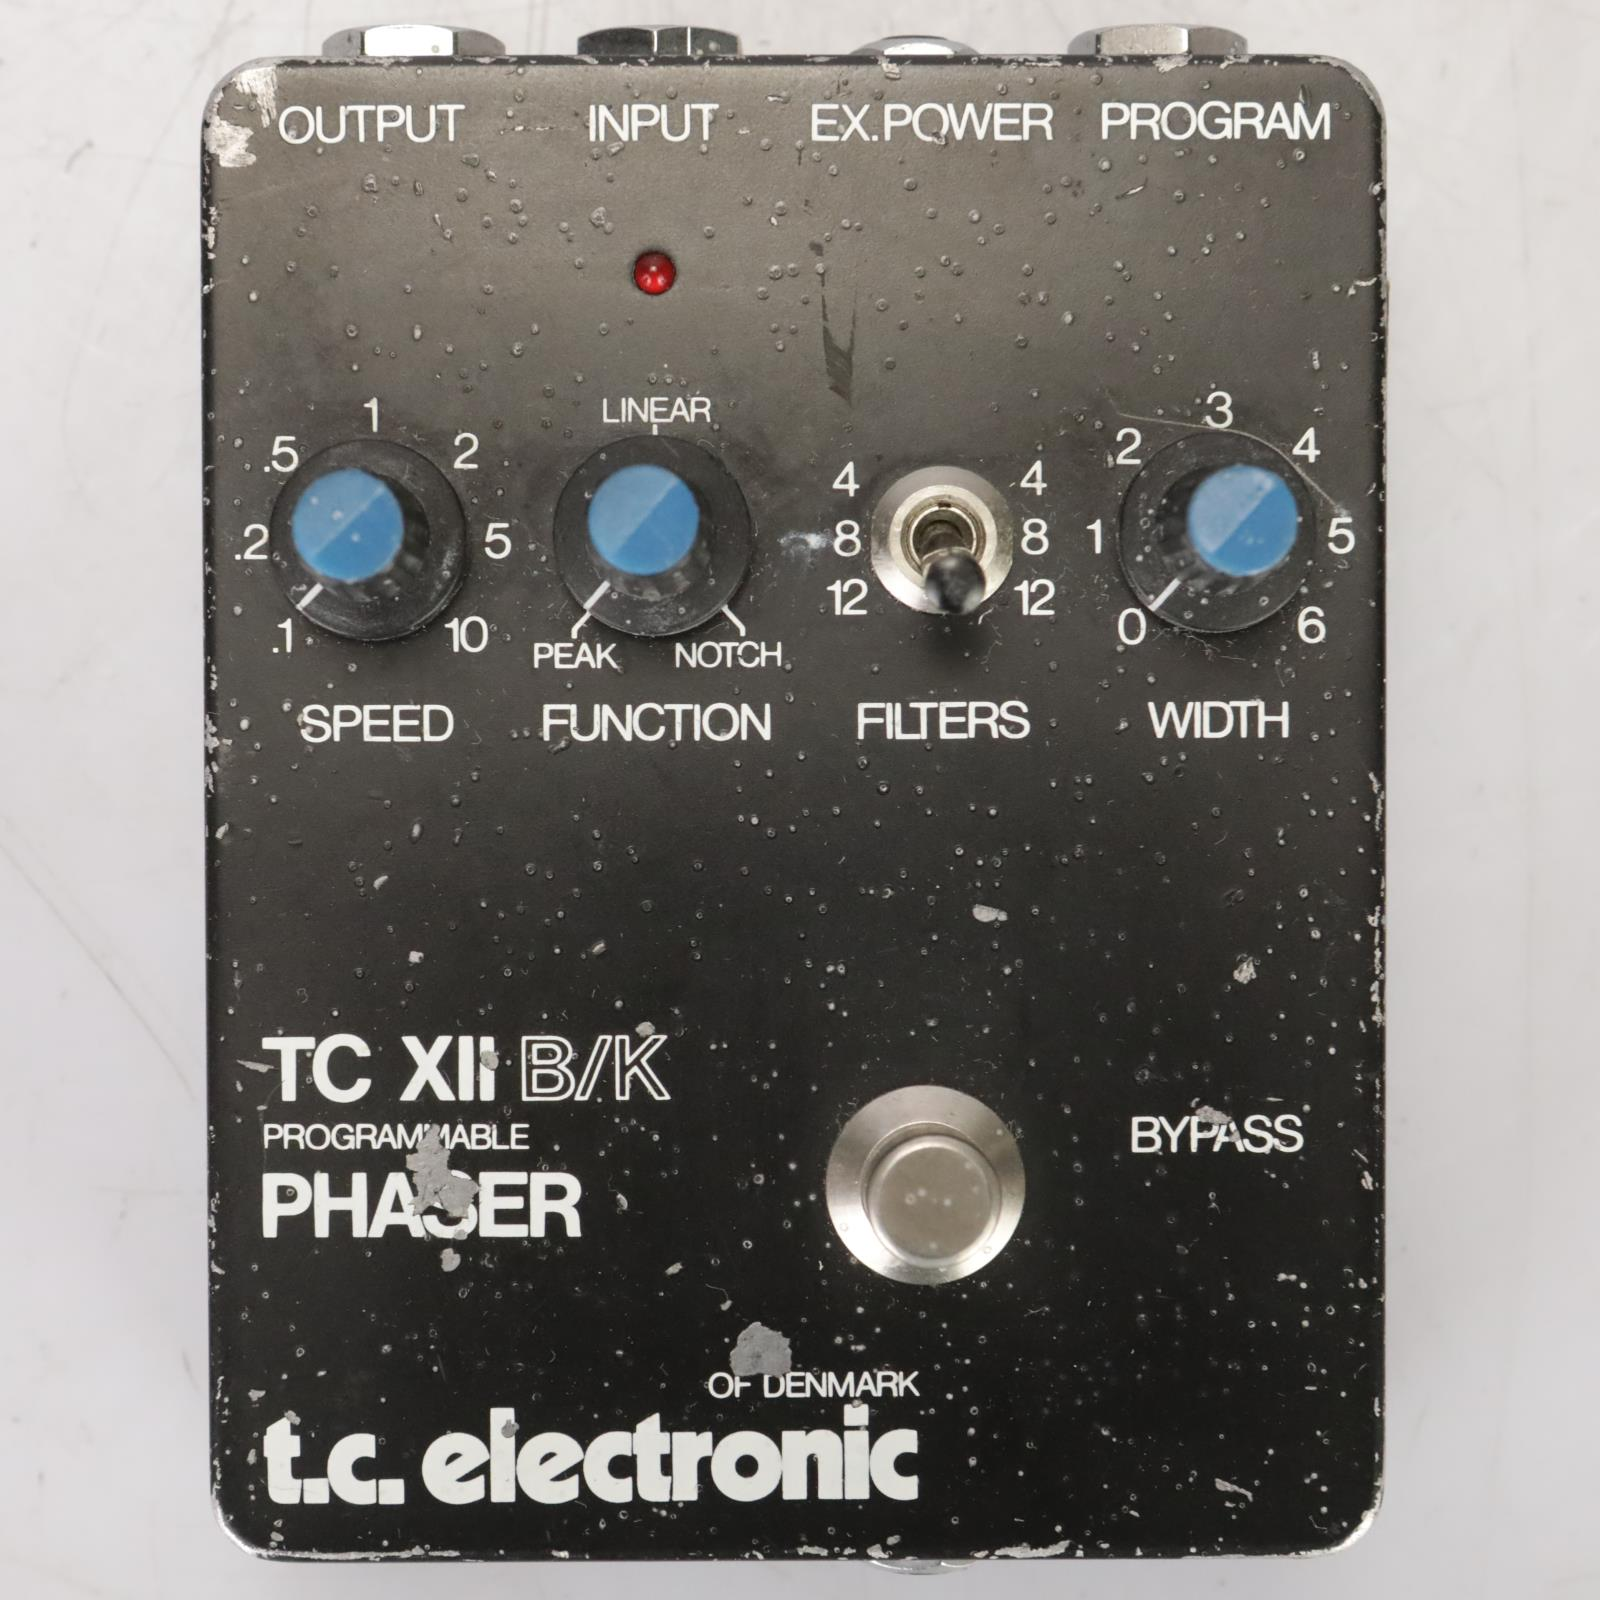 TC Electronic TC XII B/K Programmable Phaser Pedal Owned by Leland Sklar #38853